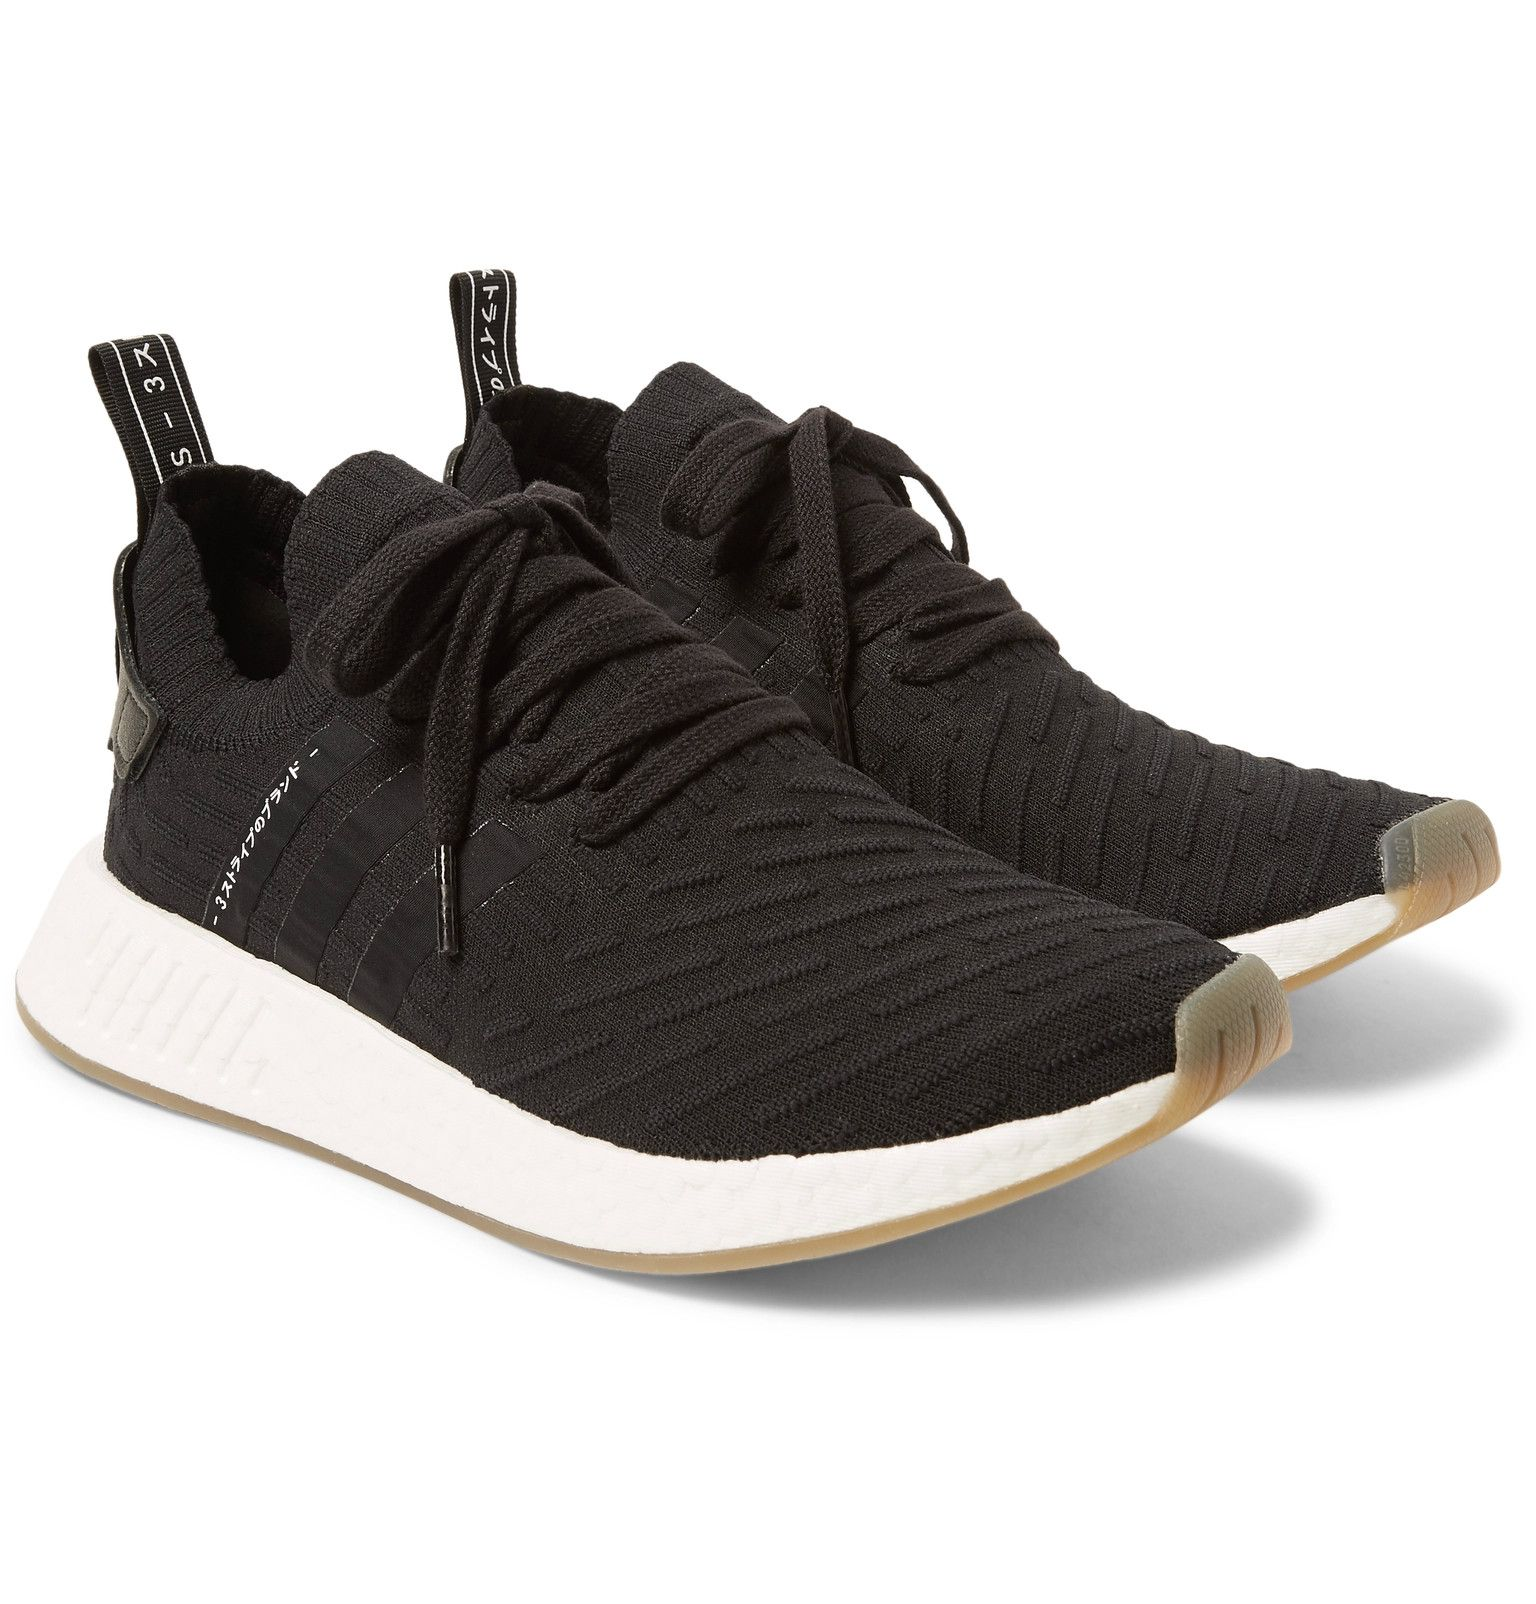 adidas Originals - NMD R2 Primeknit Sneakers